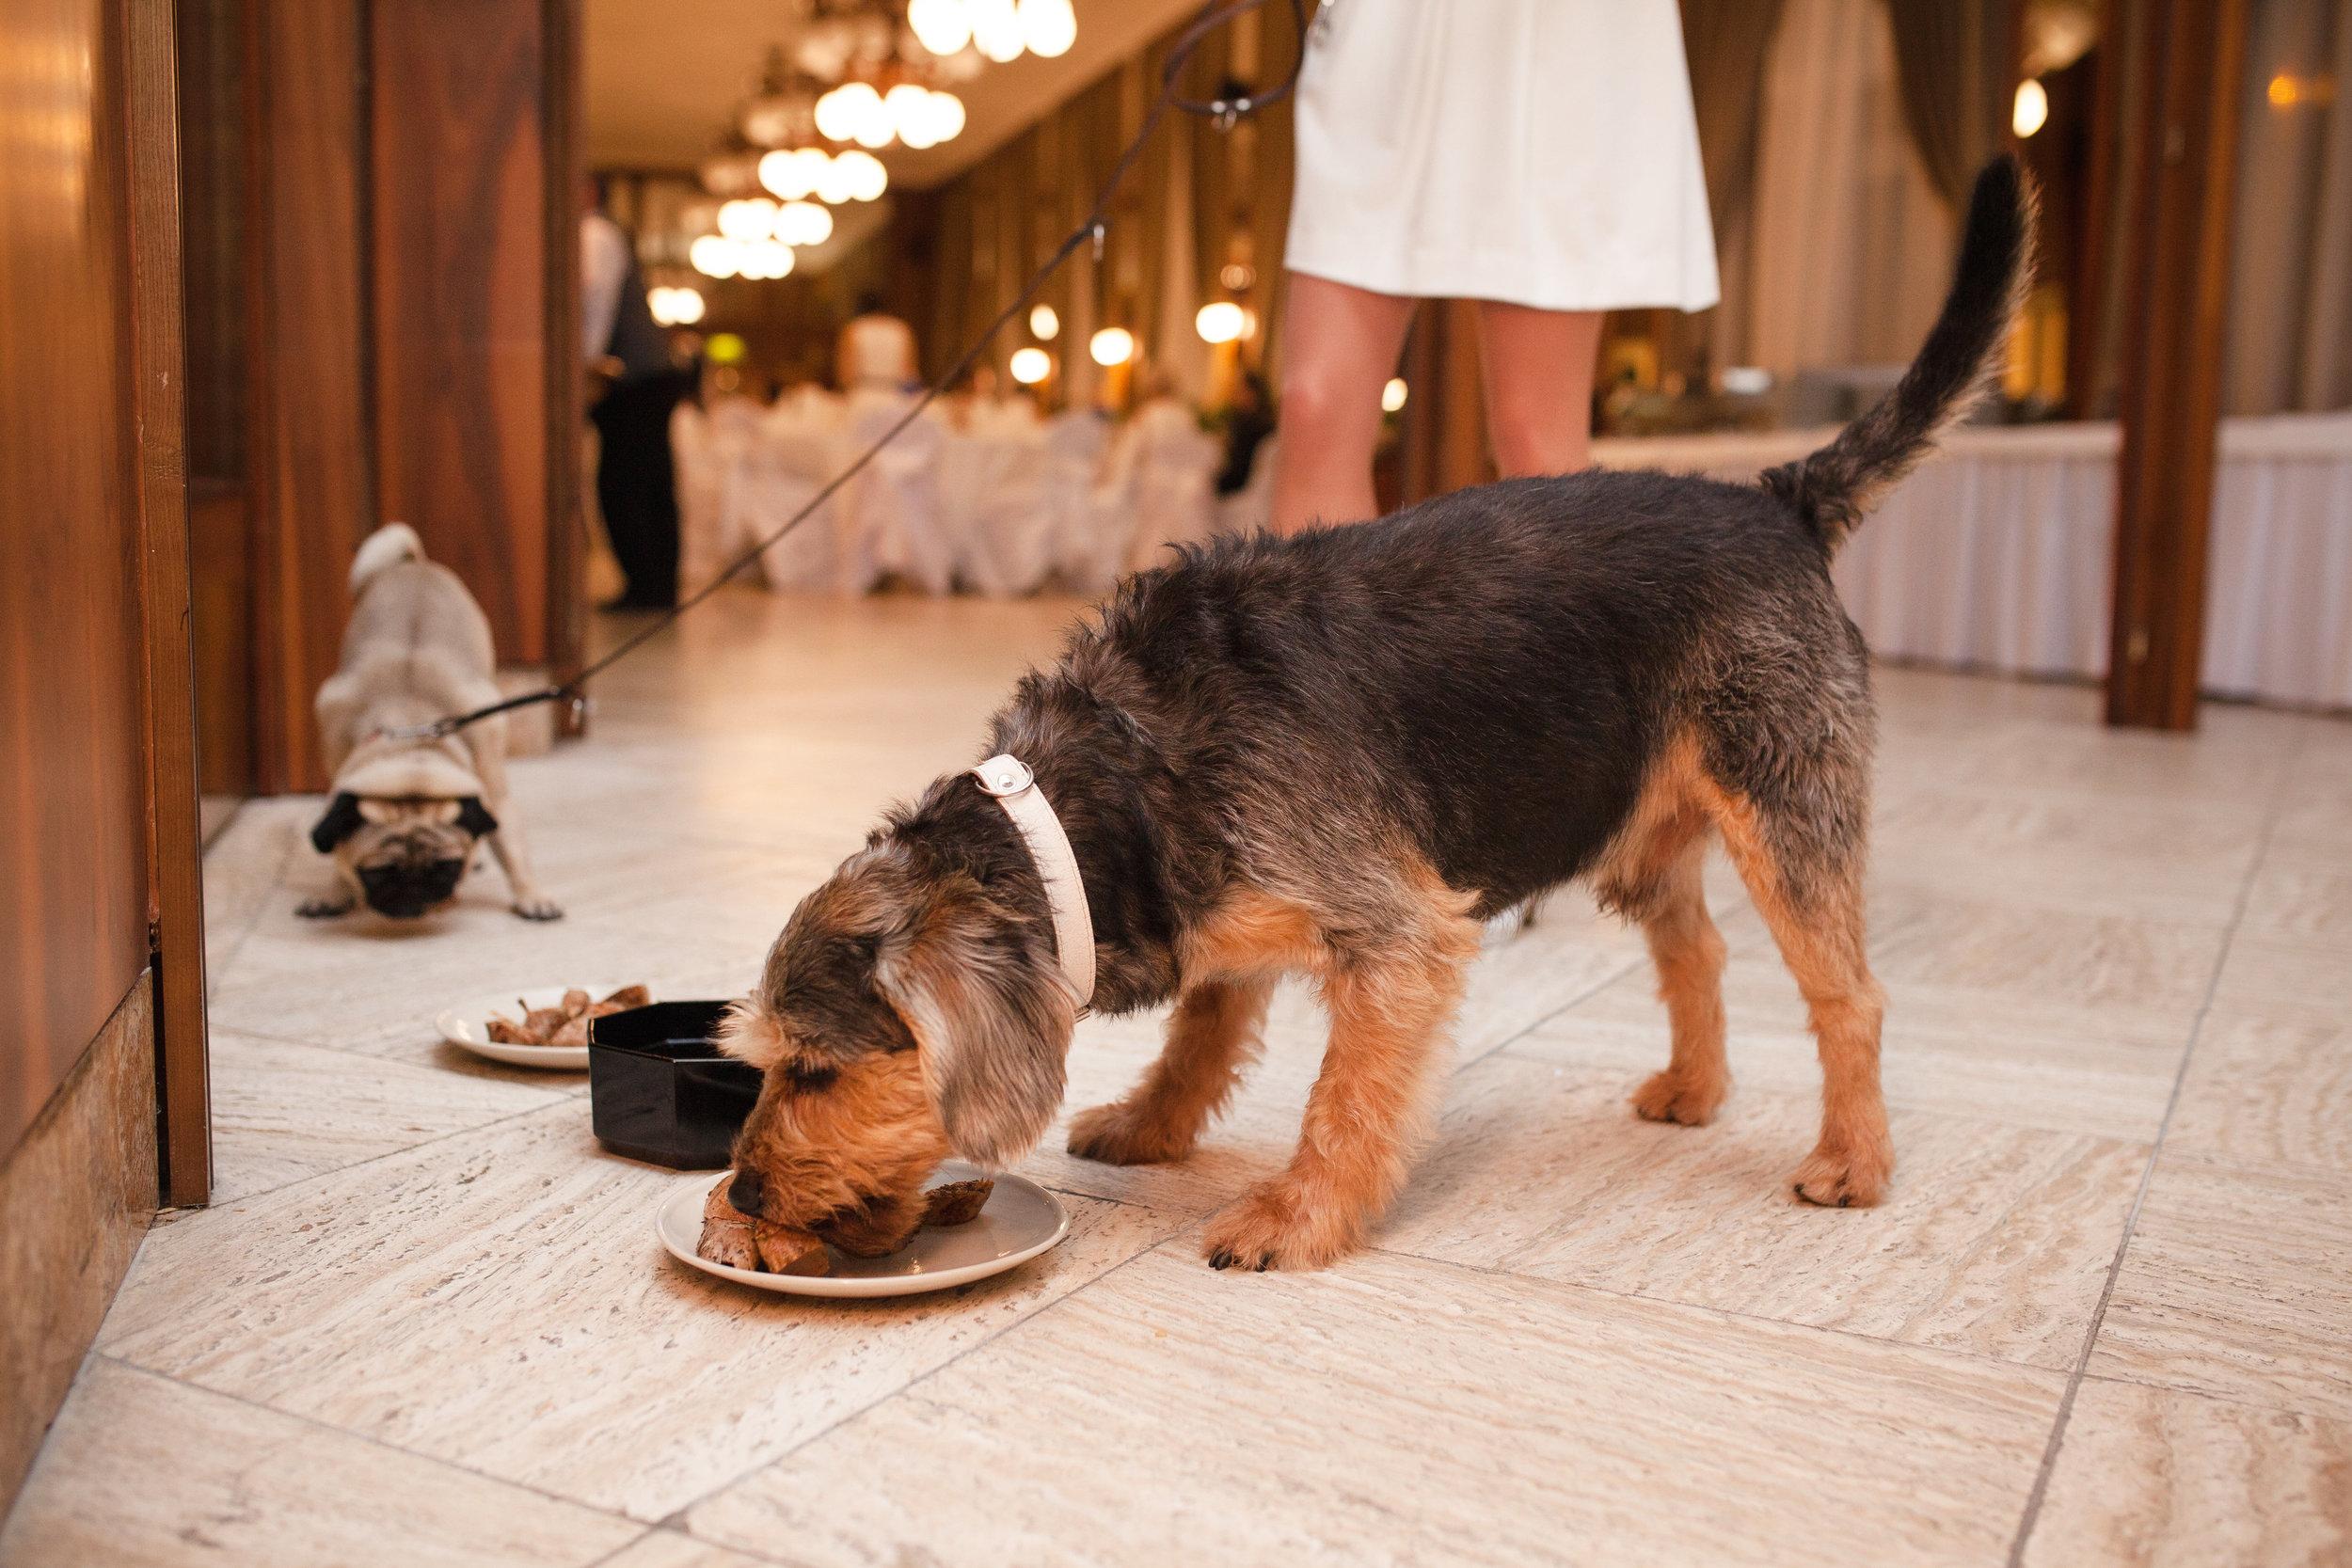 destination-wedding-photographer-slovakia-bratislava-reception-dogs-eating-2.jpg